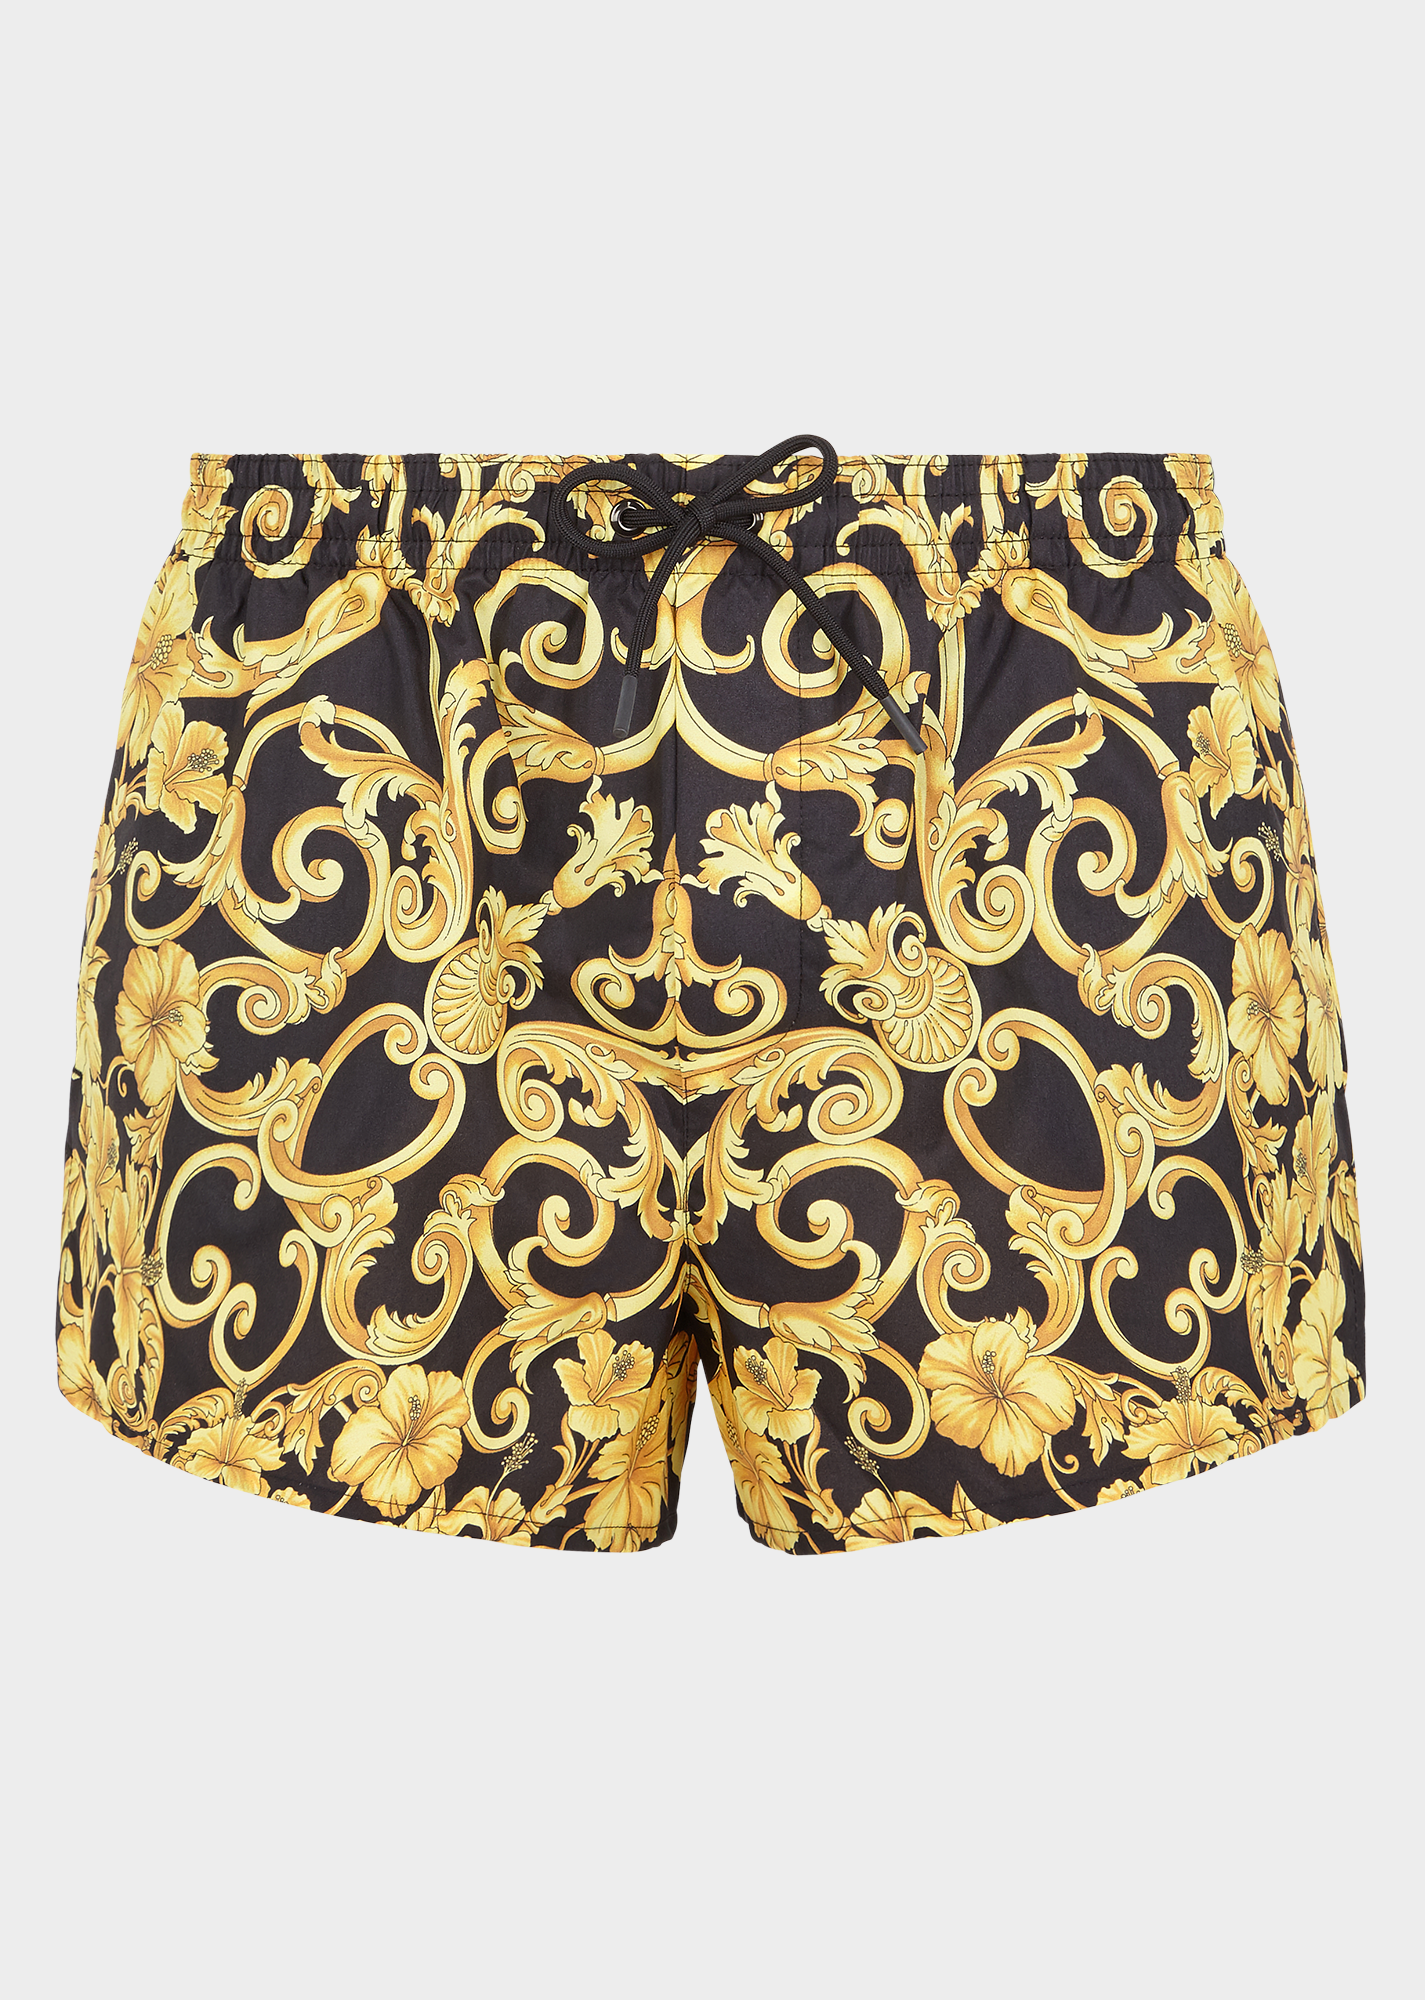 39d0a72955 VERSACE Gold Hibiscus print swim shorts. #versace #cloth | Versace ...